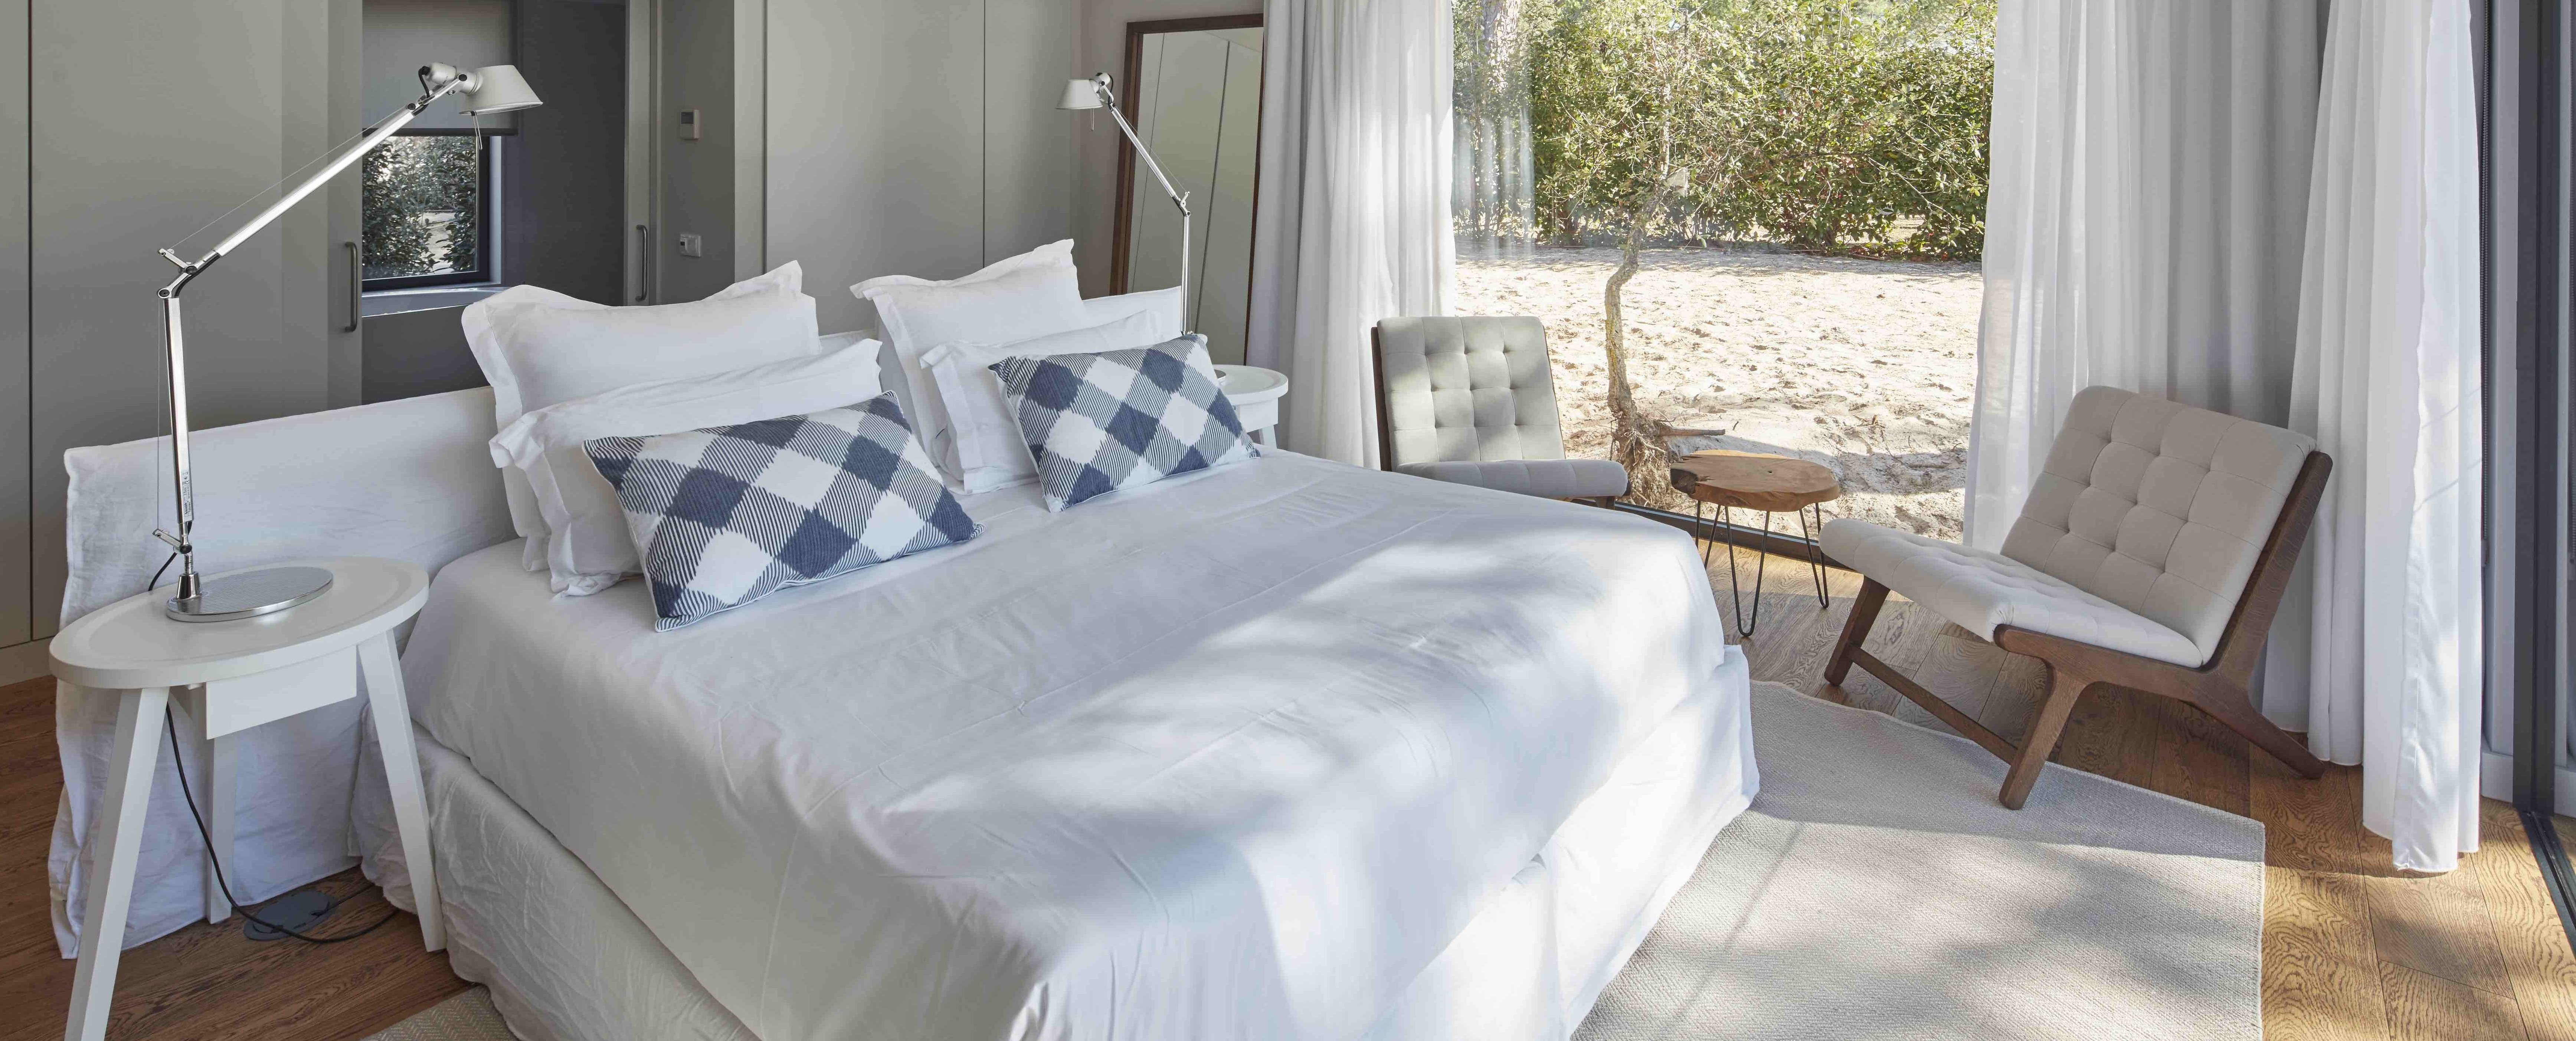 sublime-comporta-villa-bedroom